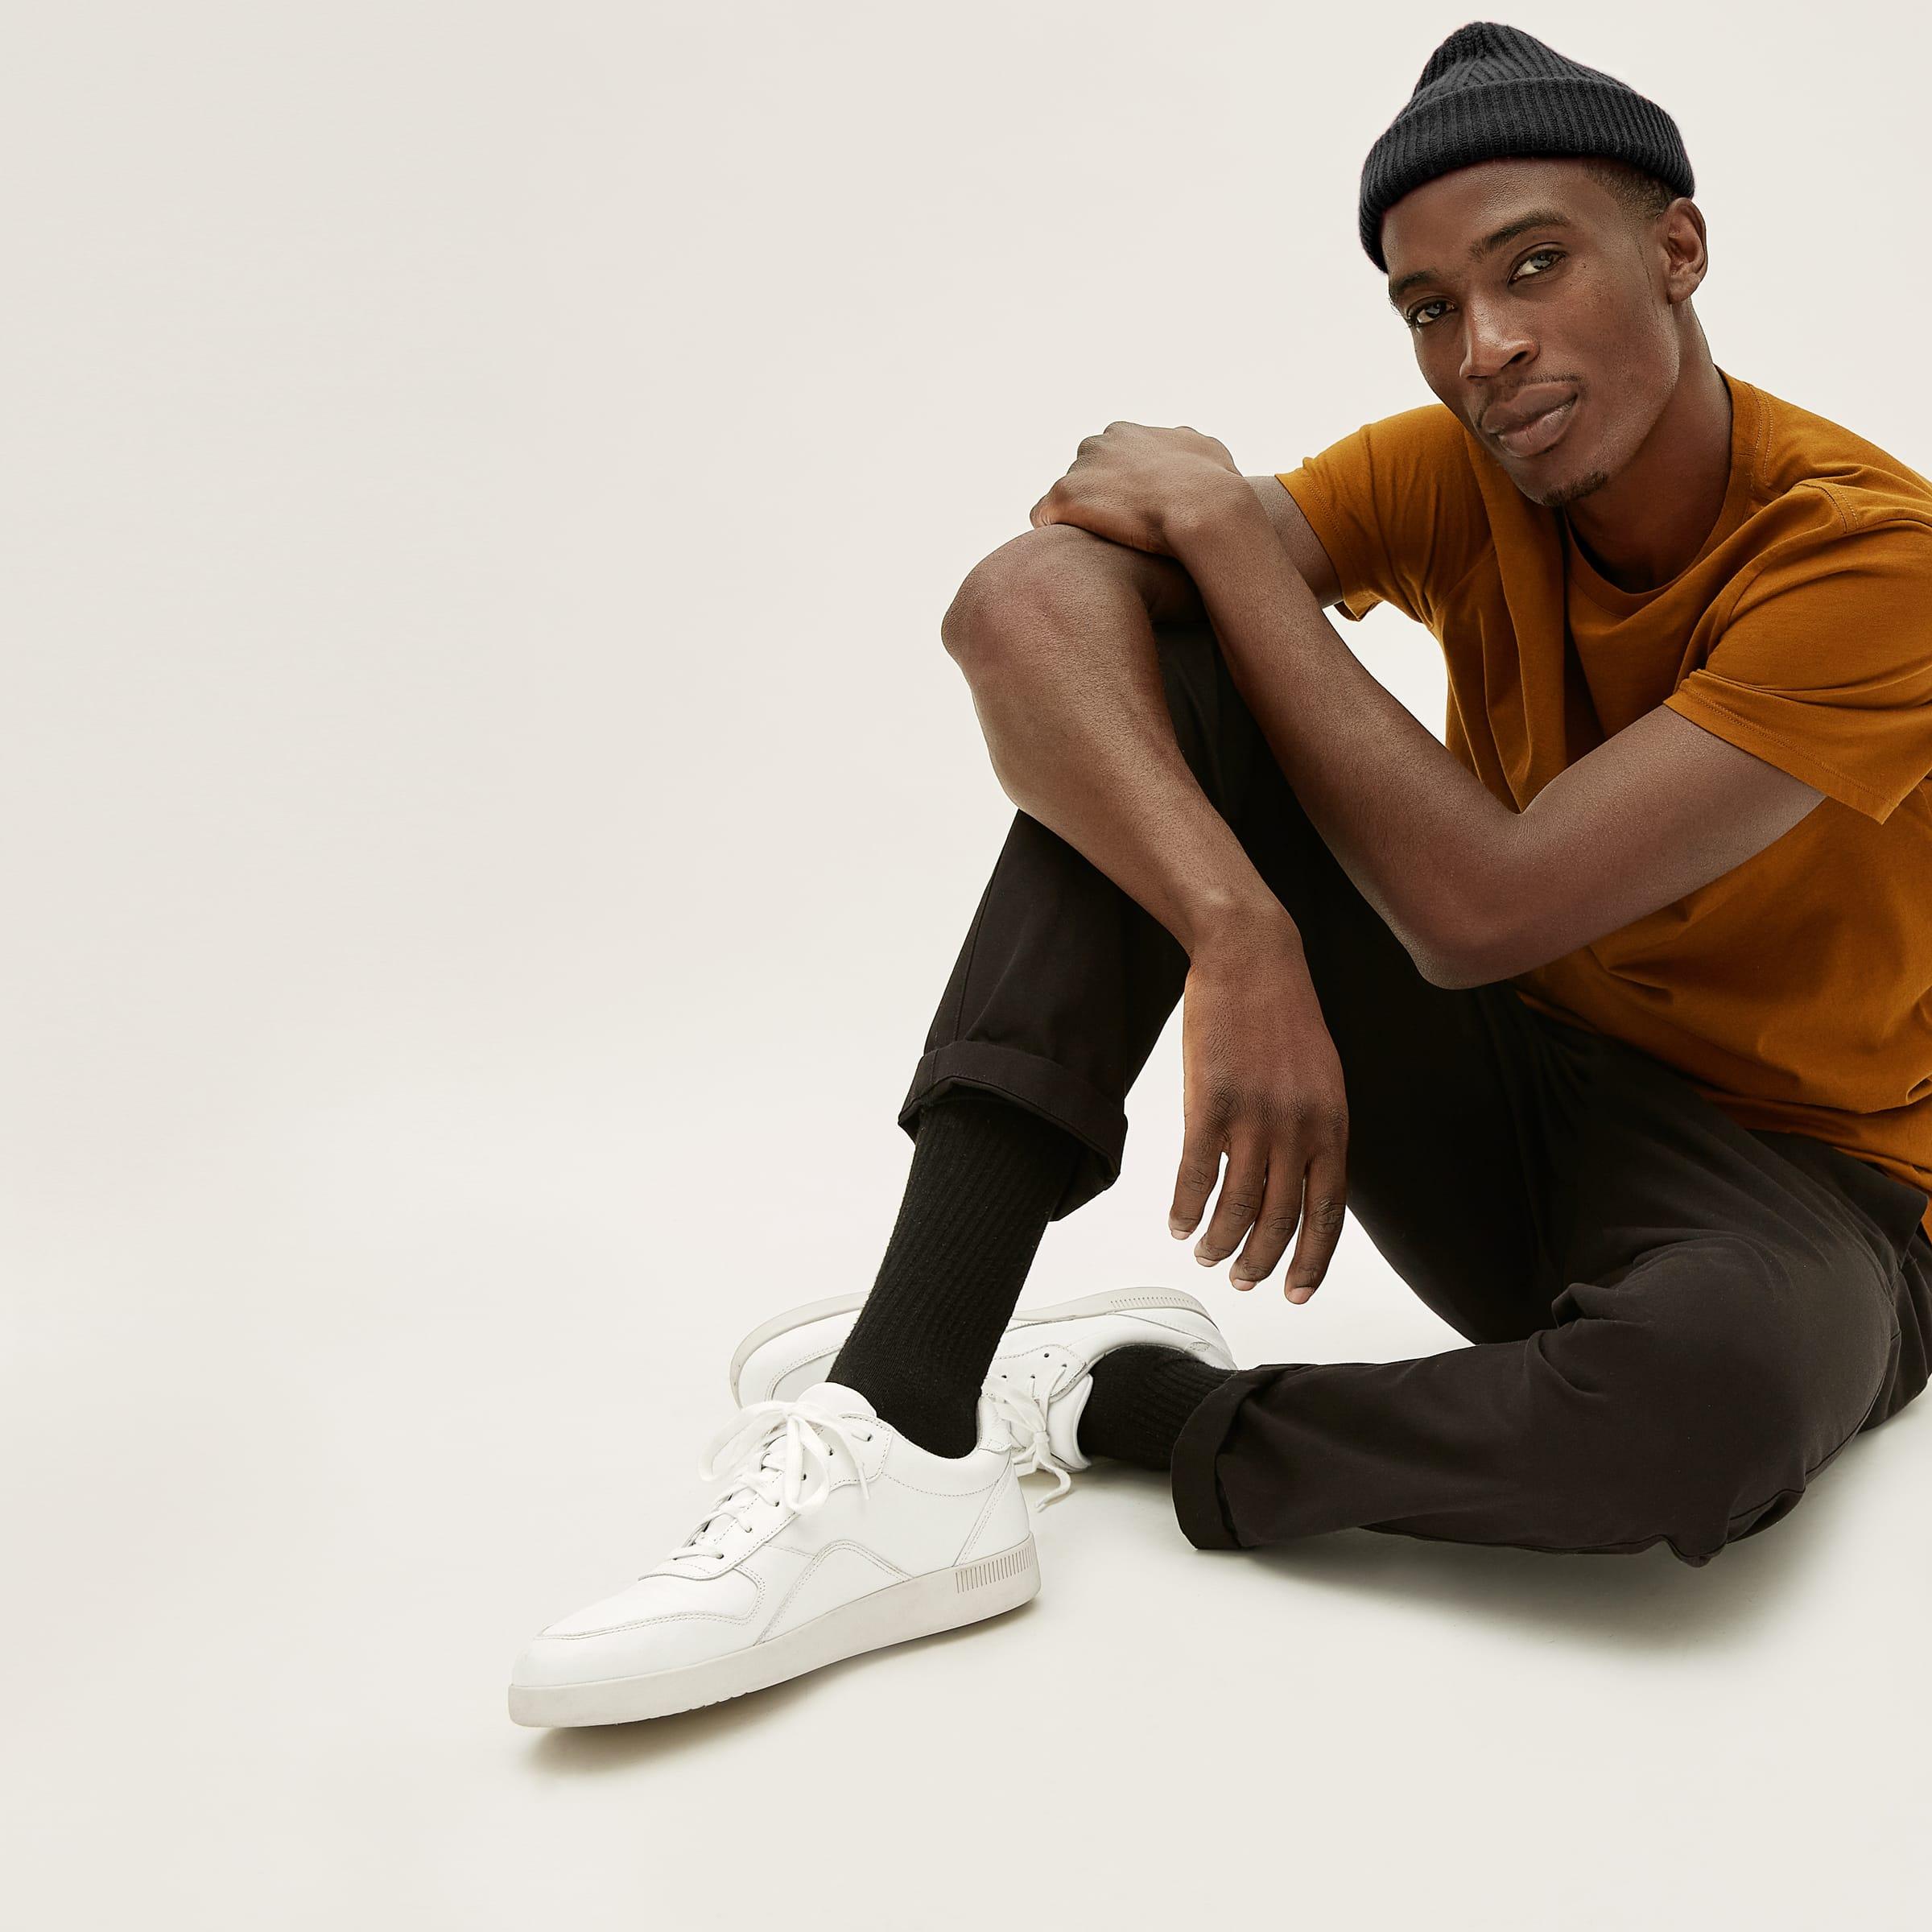 giay mua he - elle man style calendar - white sneaker -everlane